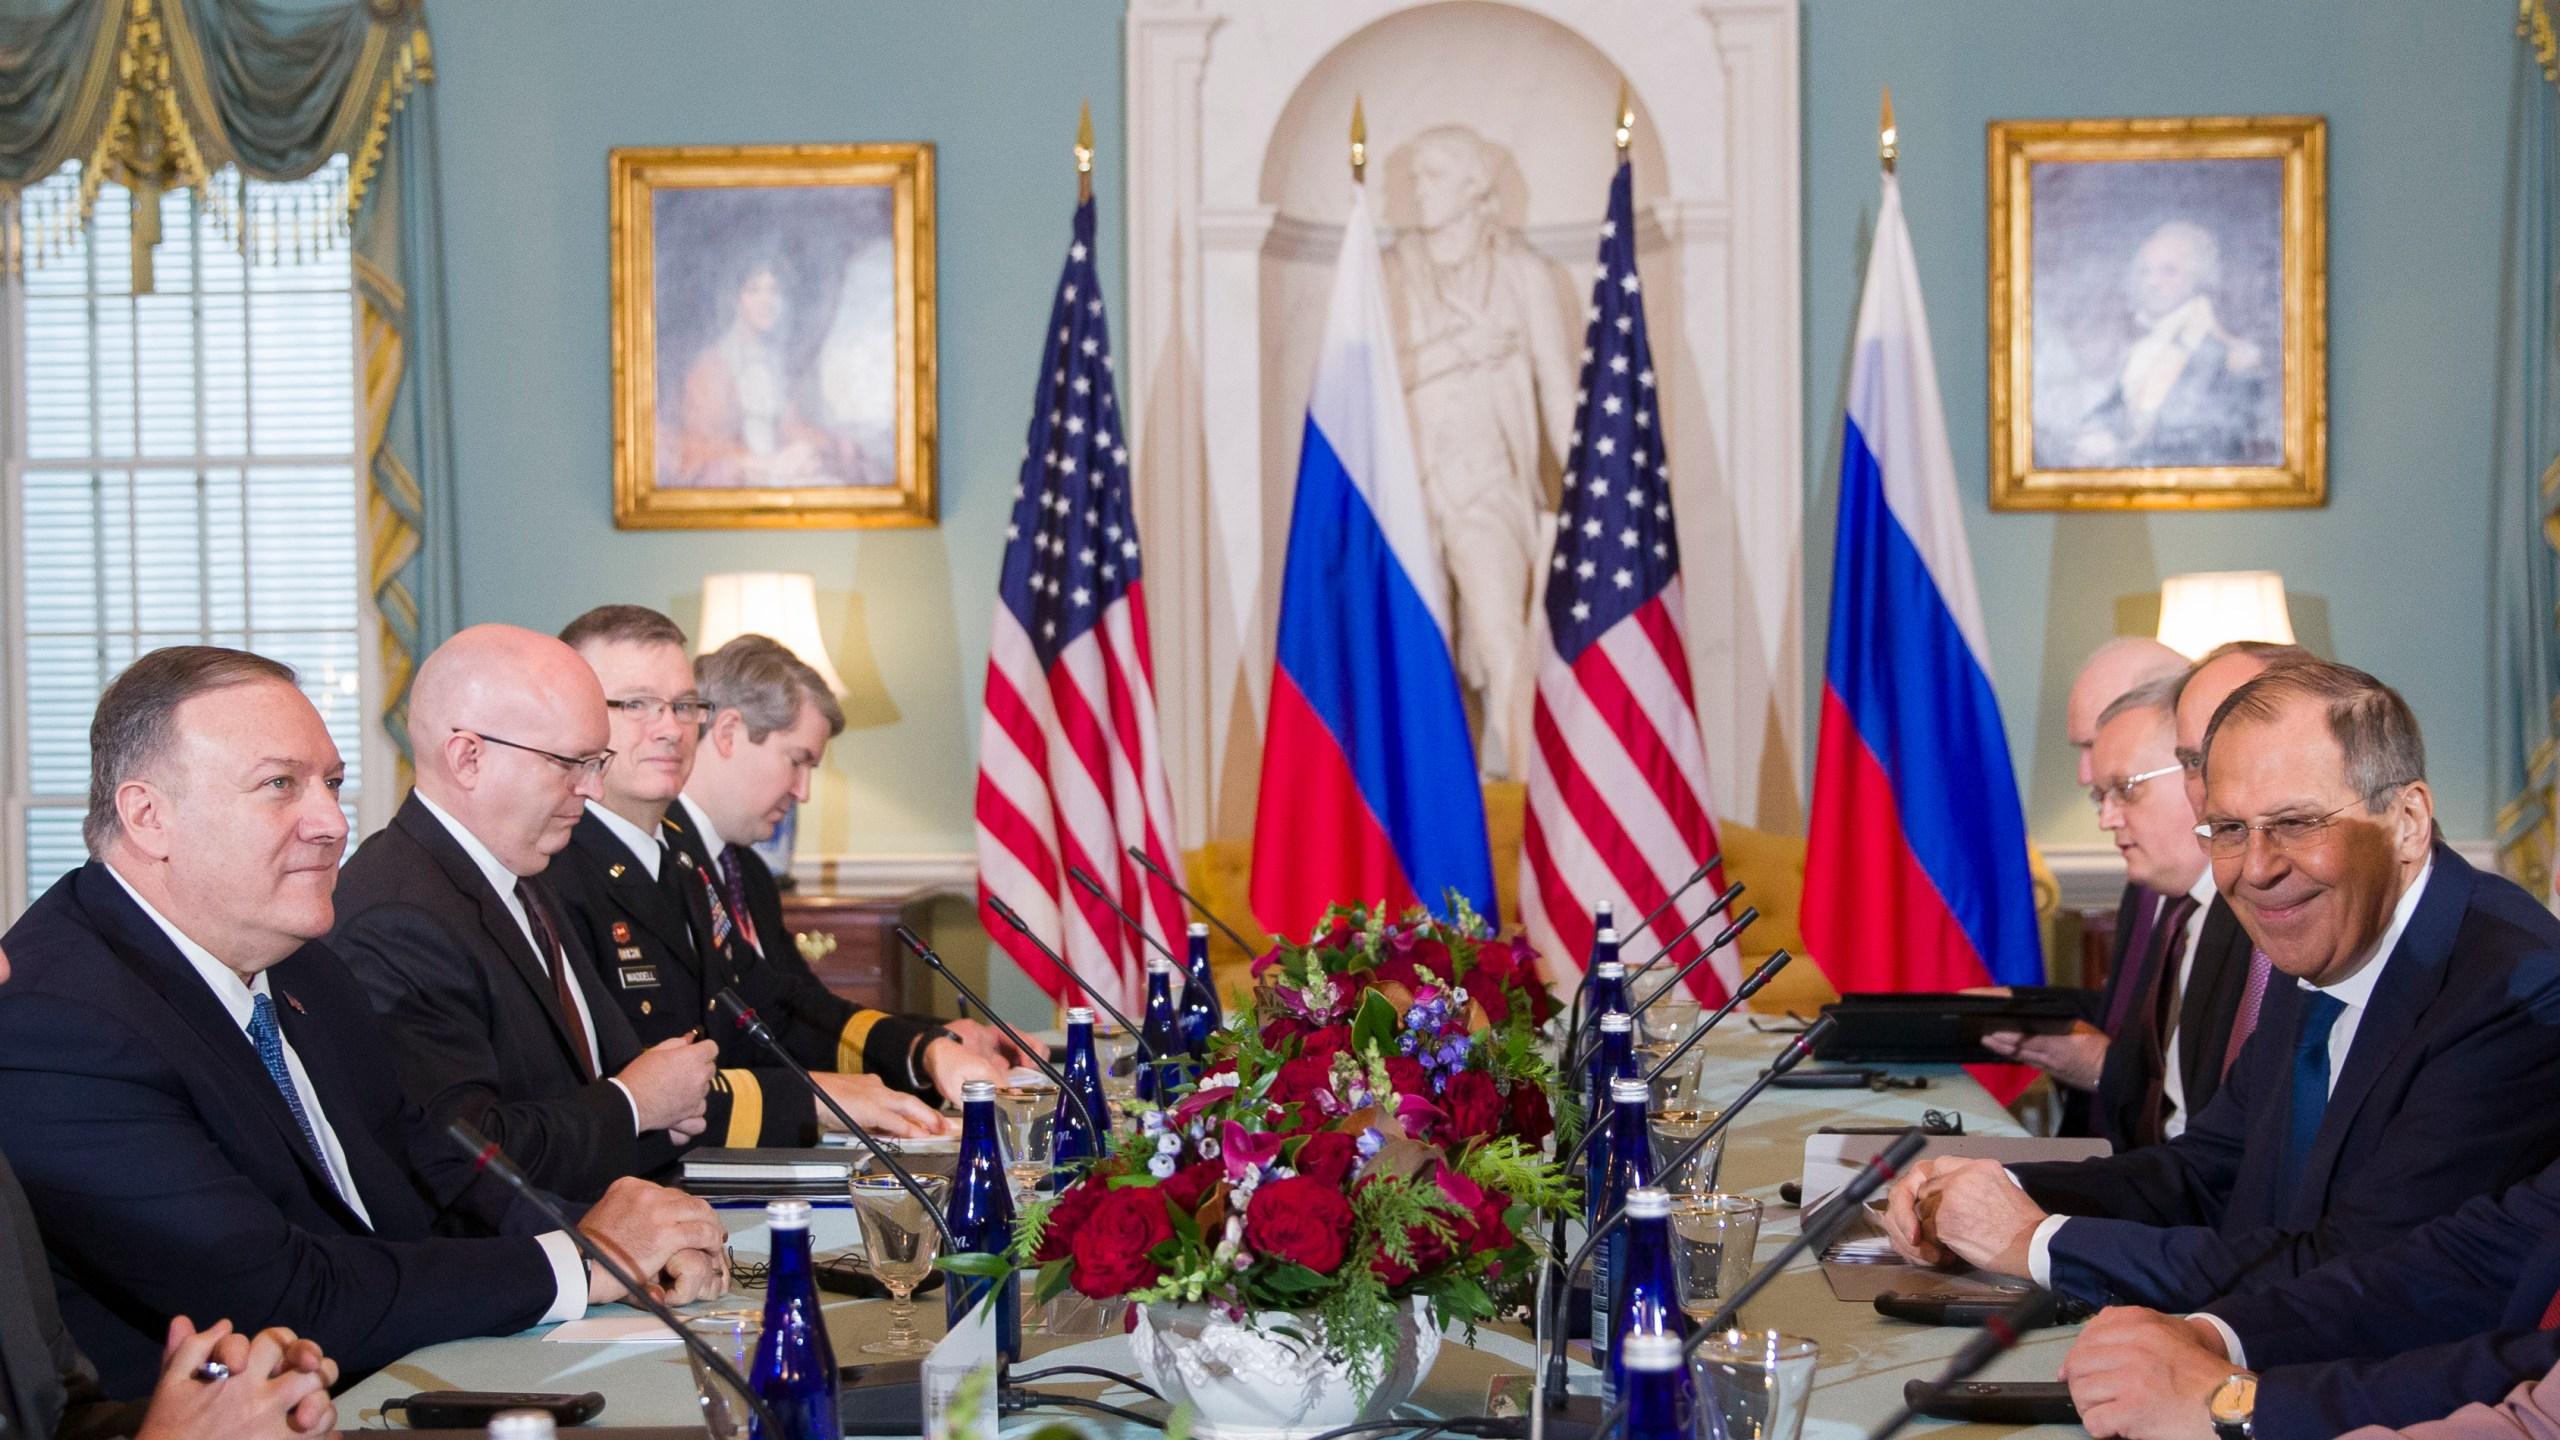 Mike Pompeo, Sergey Lavrov